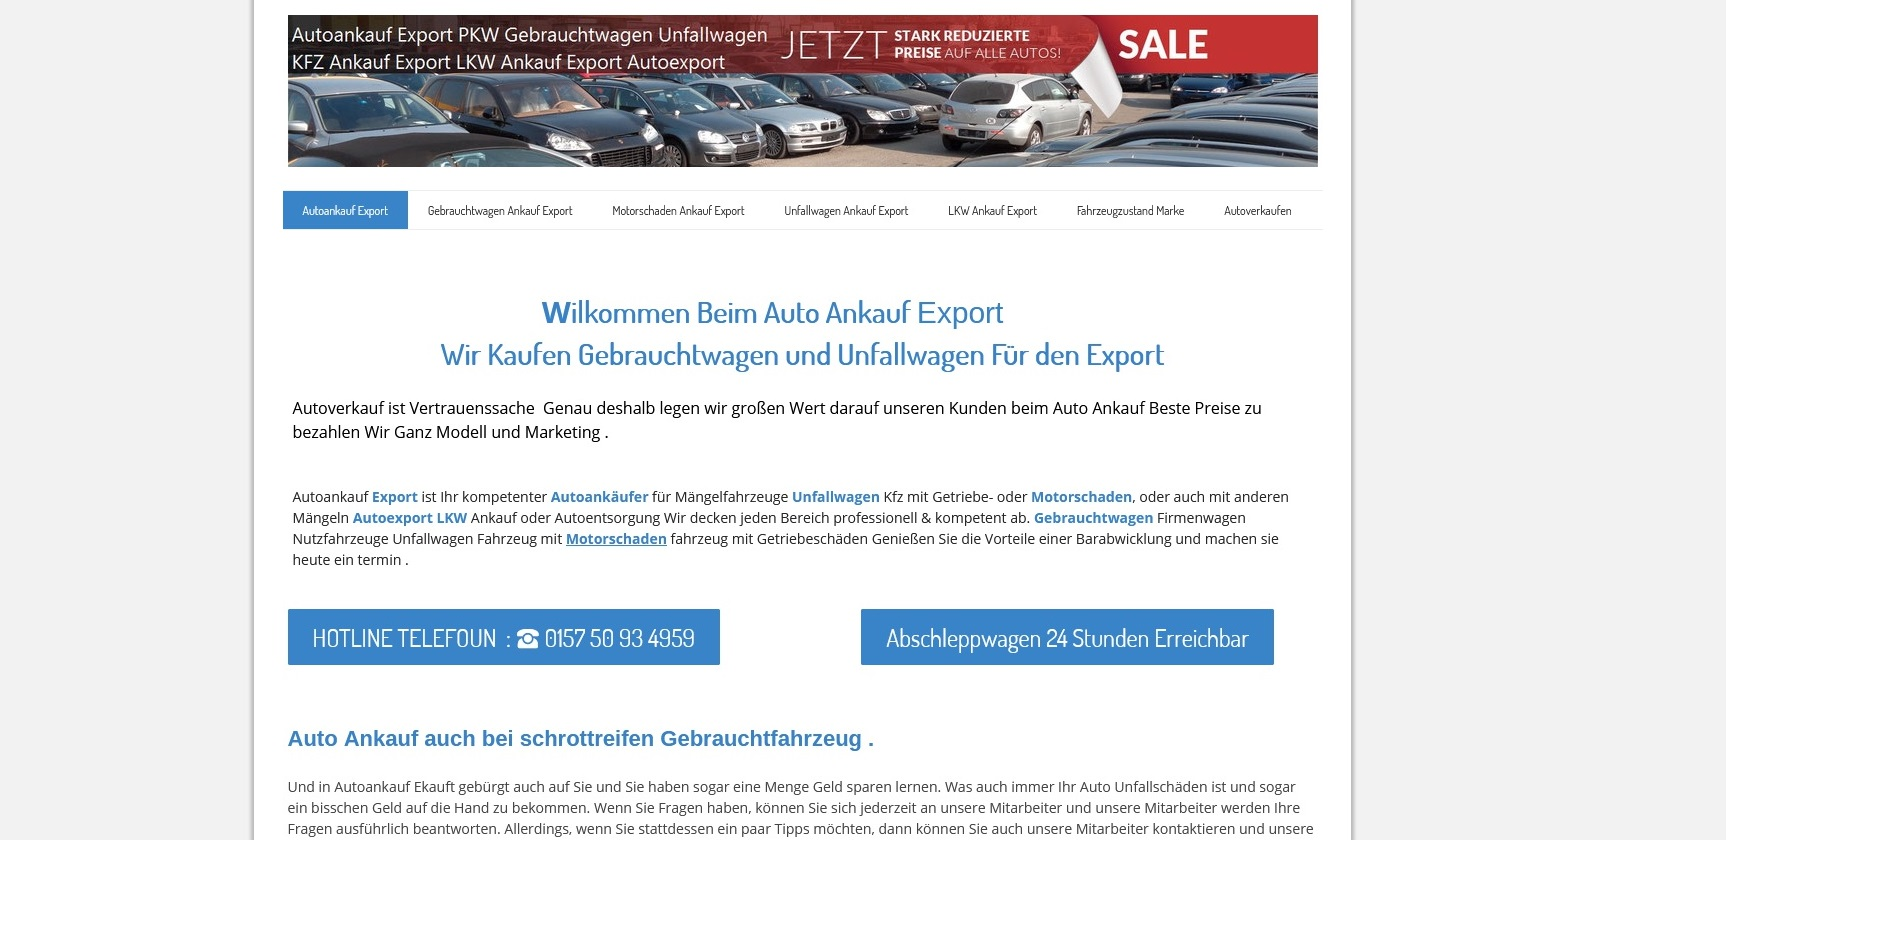 autoankauf ludwigsburg serioeser autoankauf zu bestpreisen - Autoankauf Ludwigsburg – Seriöser Autoankauf zu Bestpreisen